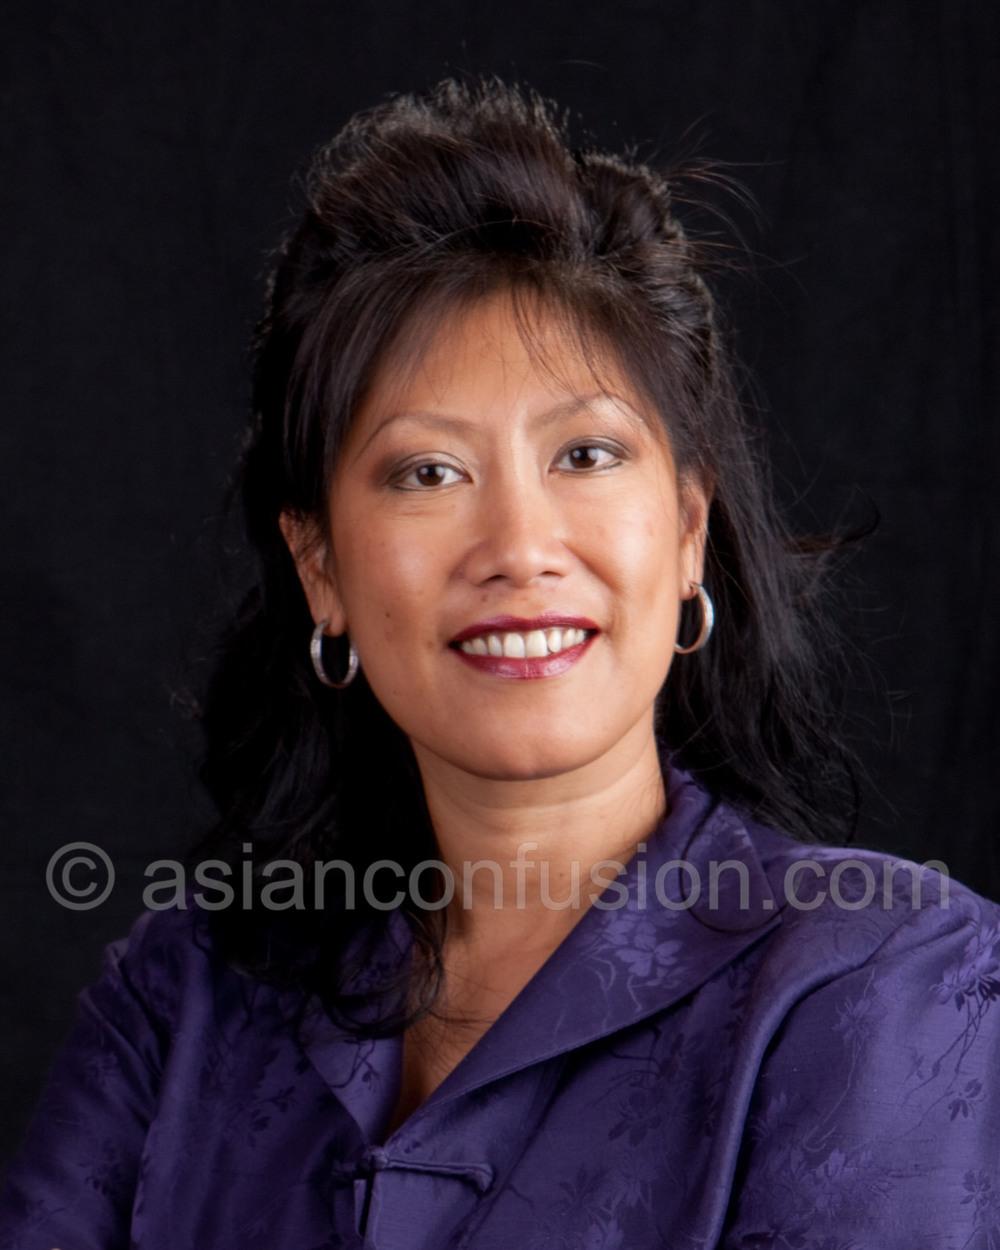 Asian Confusion - Pet - 72.jpg